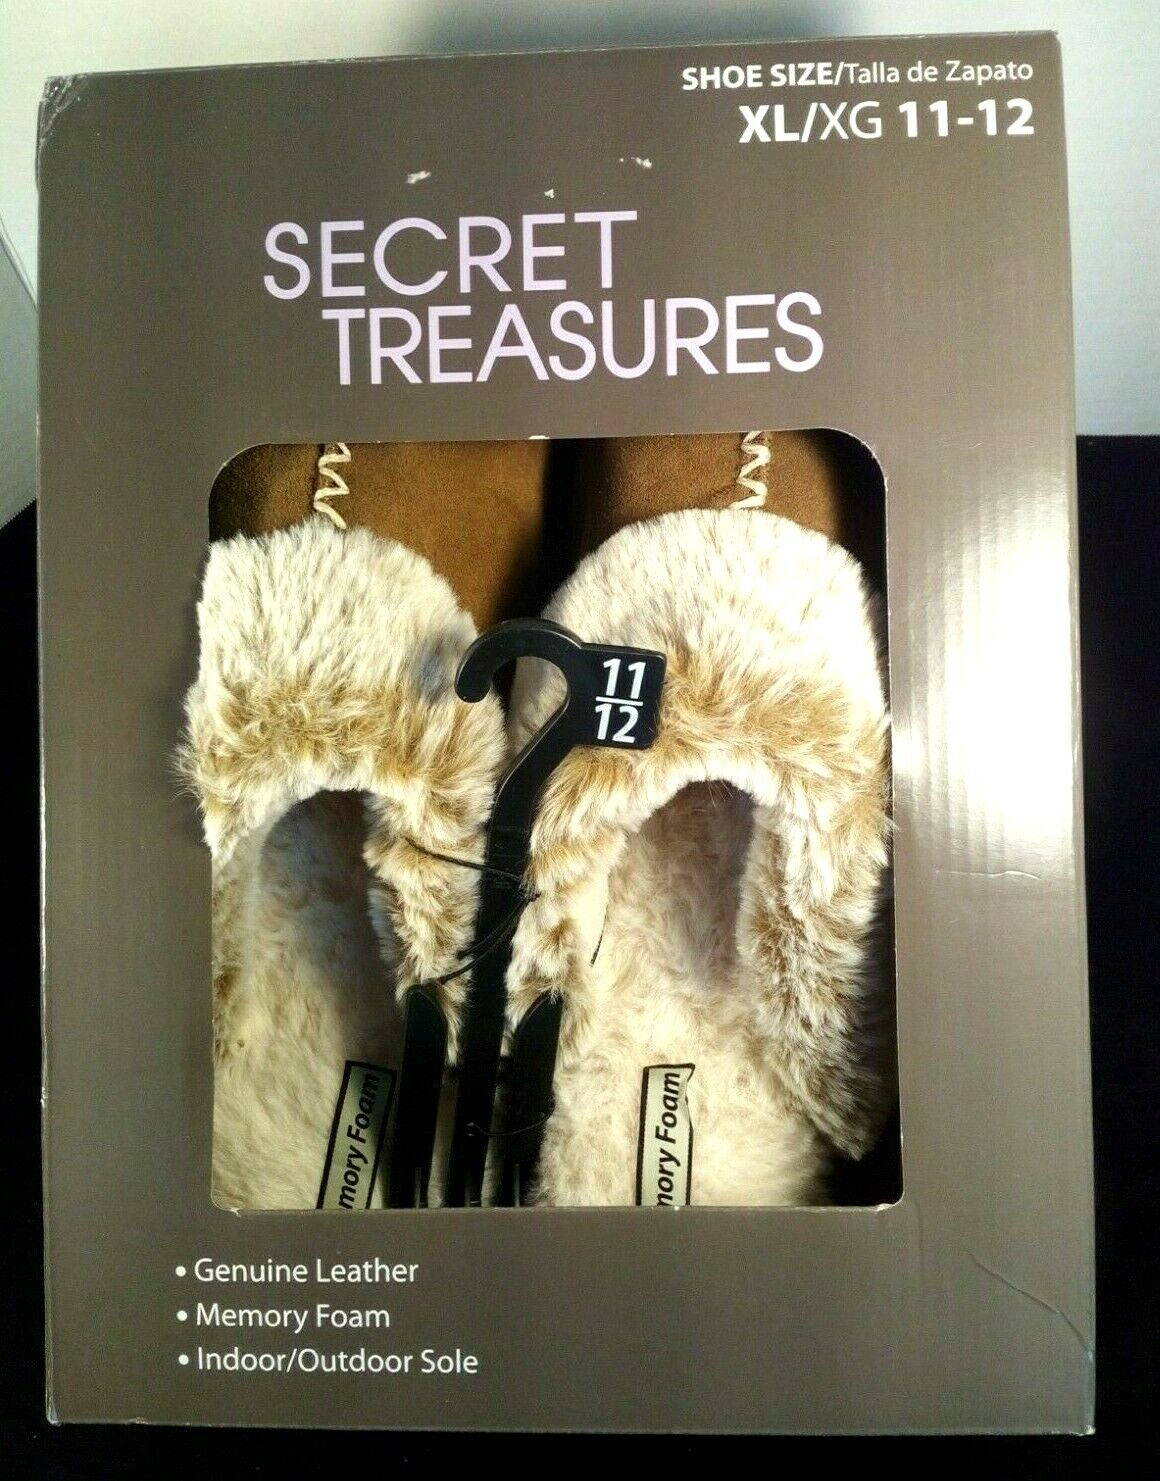 Secret Treasures Wmn Brown Suede Faux Fur Memory Foam Clog Slippers Sz 11-12 NIB